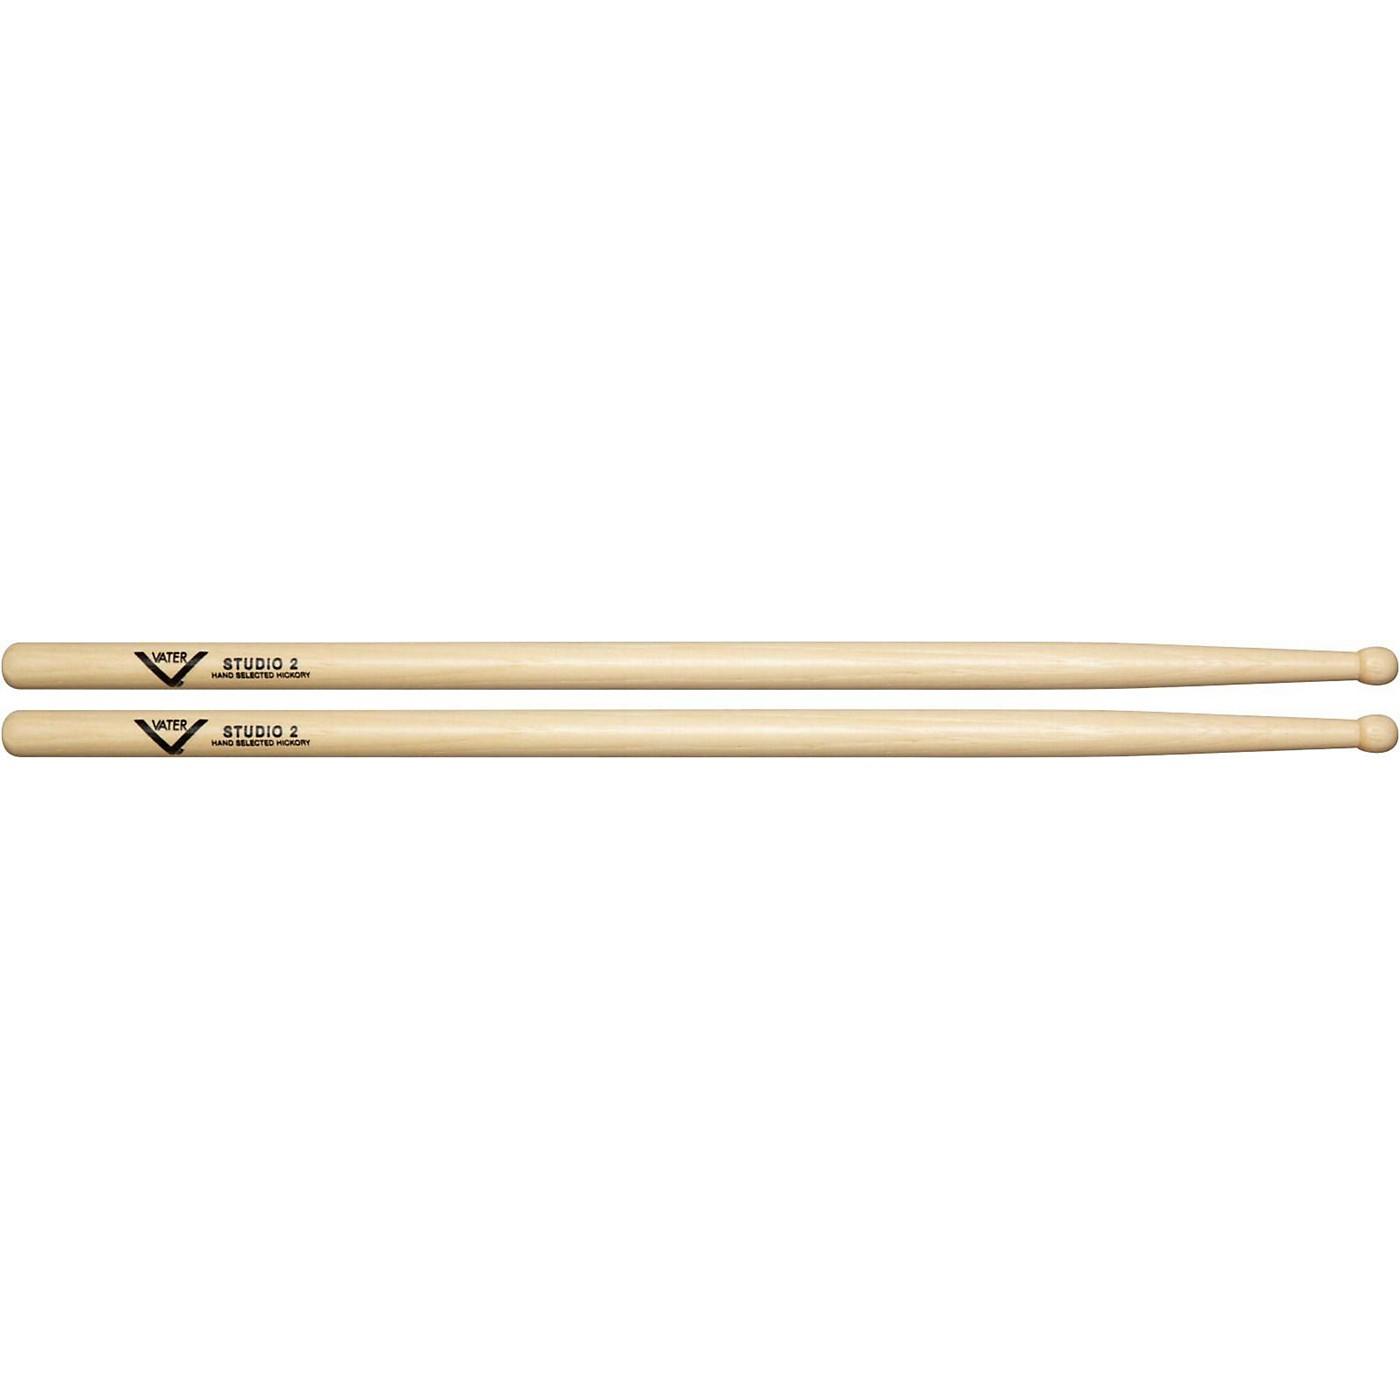 Vater American Hickory Studio 2 Drumsticks thumbnail